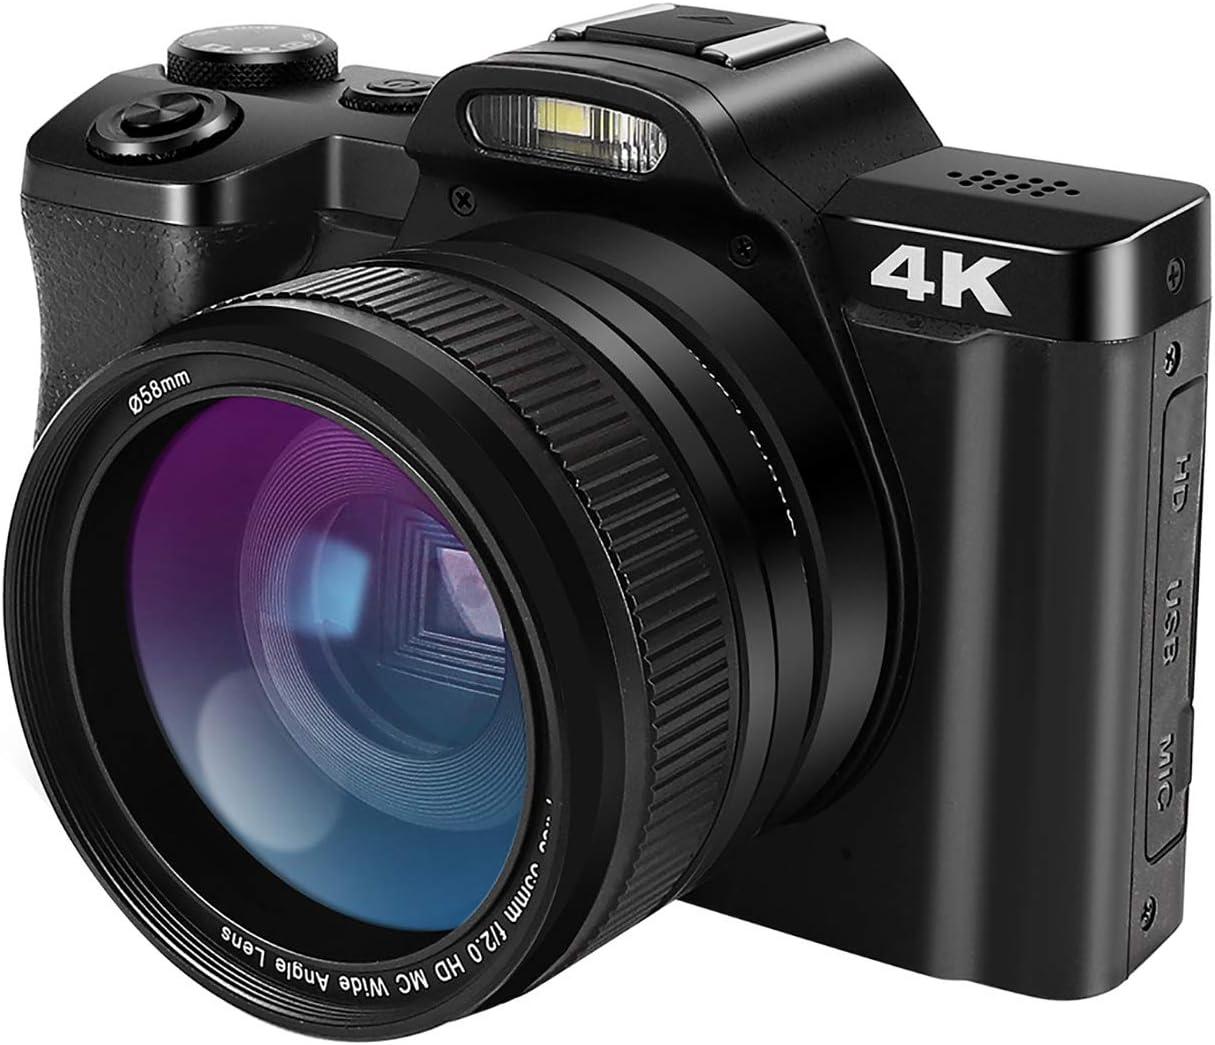 48 MP HD 1080P Videoc/ámara YouTube Vlogging C/ámara con lente gran angular Zoom digital 16X WiFi Detecci/ón de cara t/áctil habilitada 3.5 pulgadas IPS LCD pantalla t/áctil C/ámara digital 4K